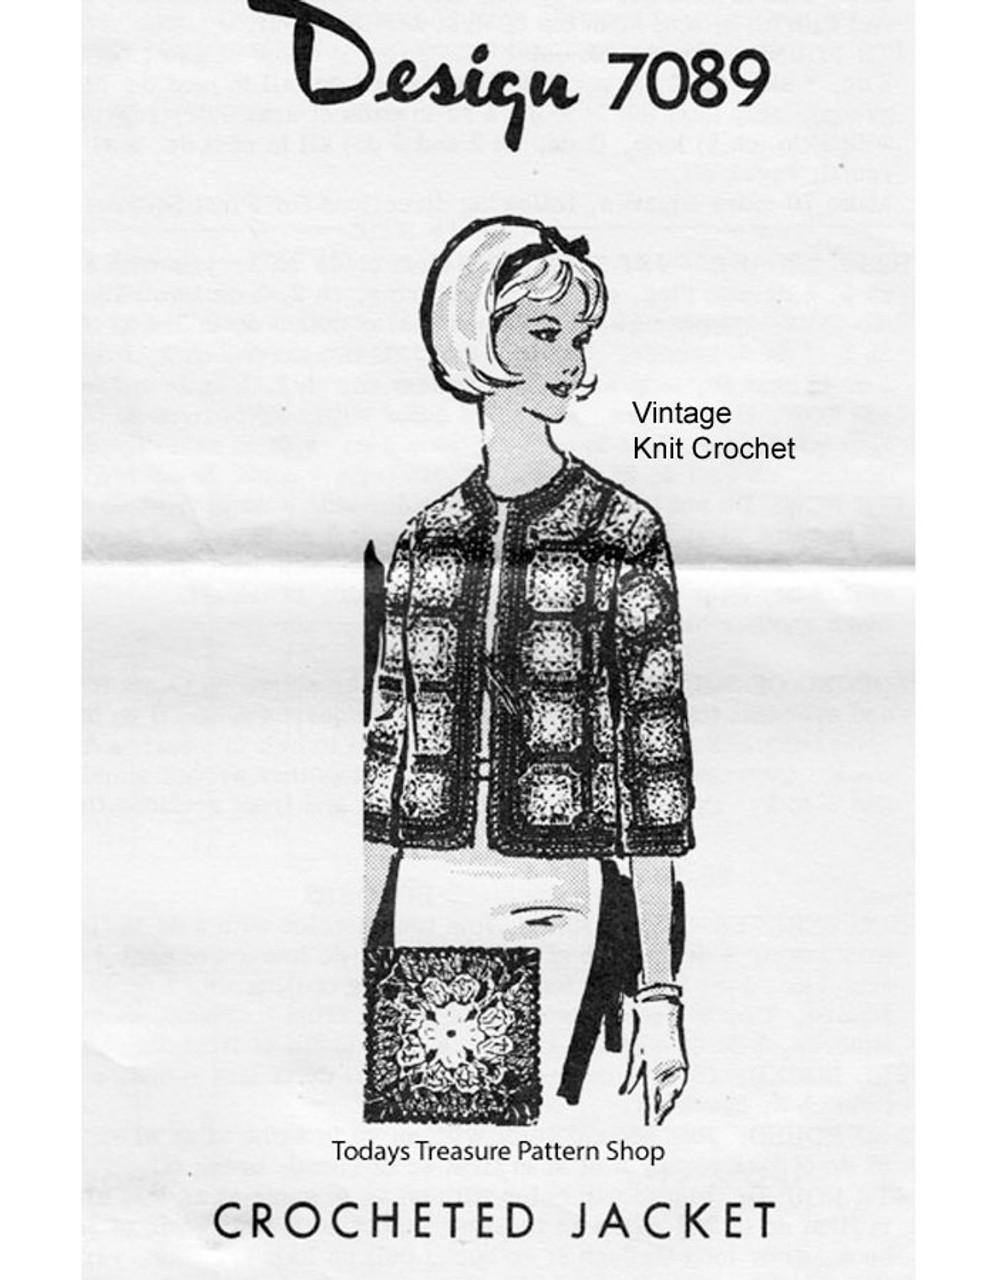 Crochet Granny Block Jacket Pattern Design 7089